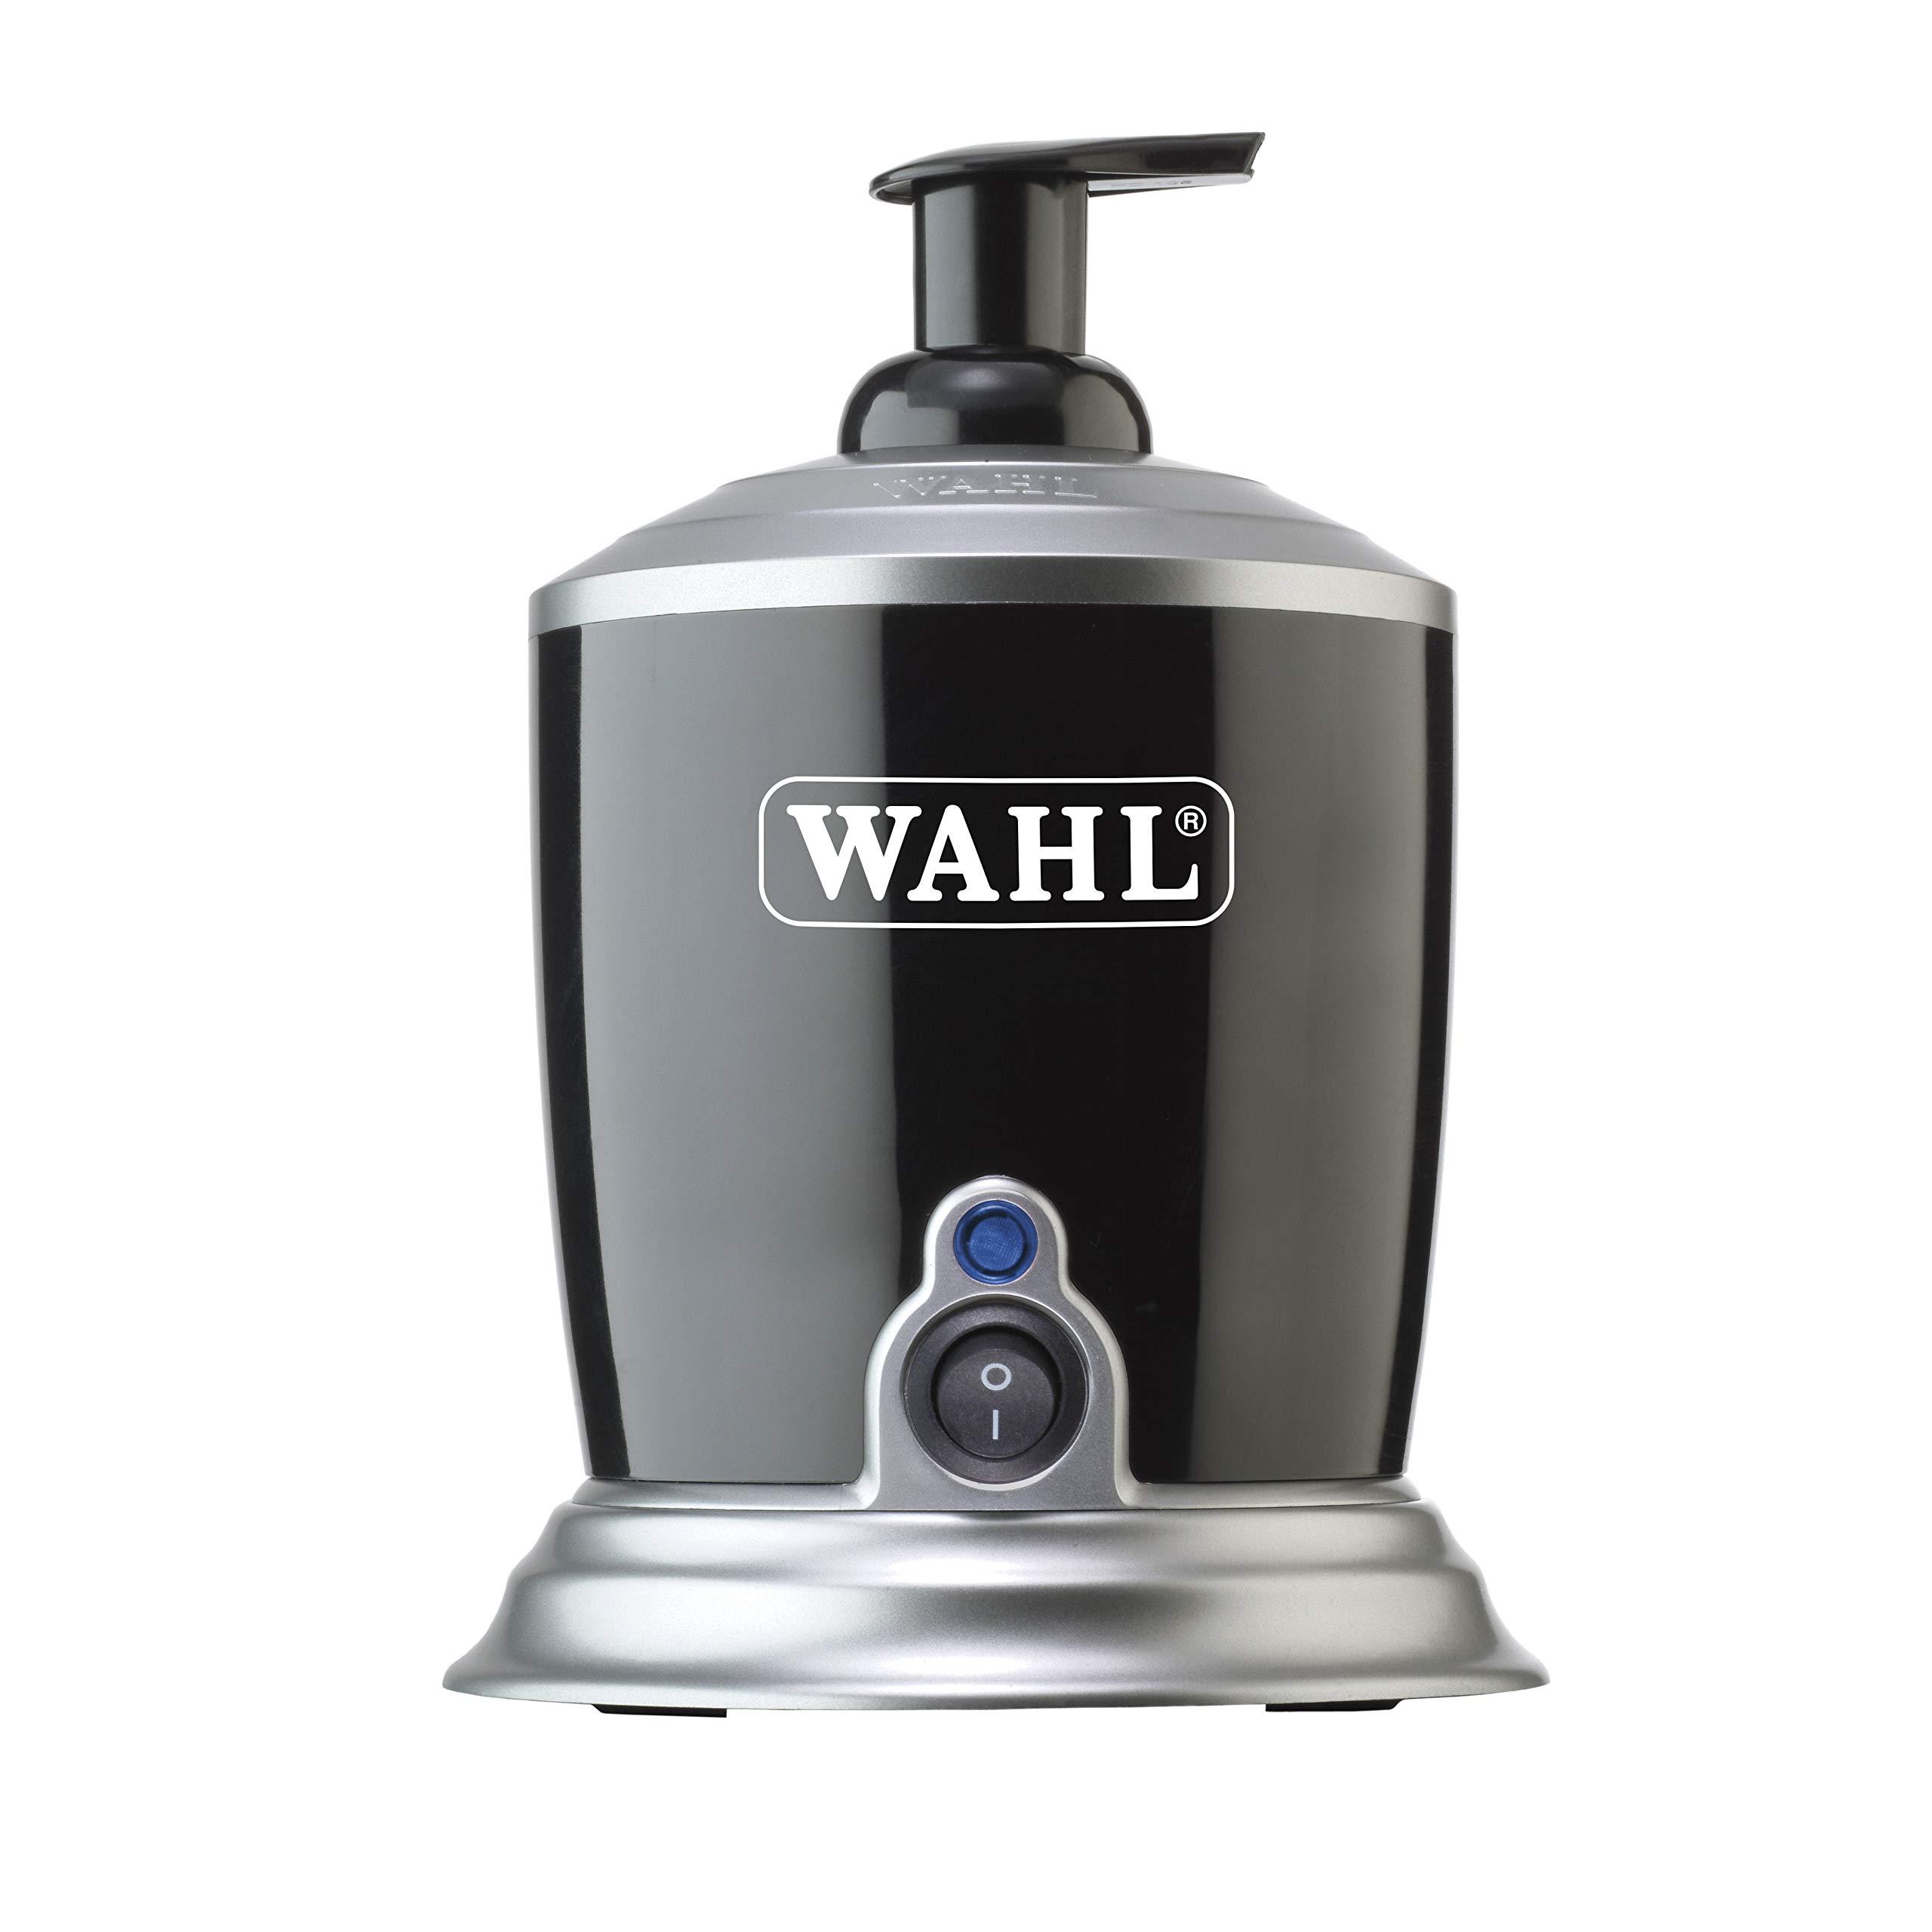 Wahl Professional '19 Hot Lather Machine #68908 - Professional Barber Quality Dispenser with Internal Liquid Pump, Bottle, Additional Bonus Liquid Pump, and 12 oz. Bottle of Pre-Mixed Liquid Lather by Wahl Professional